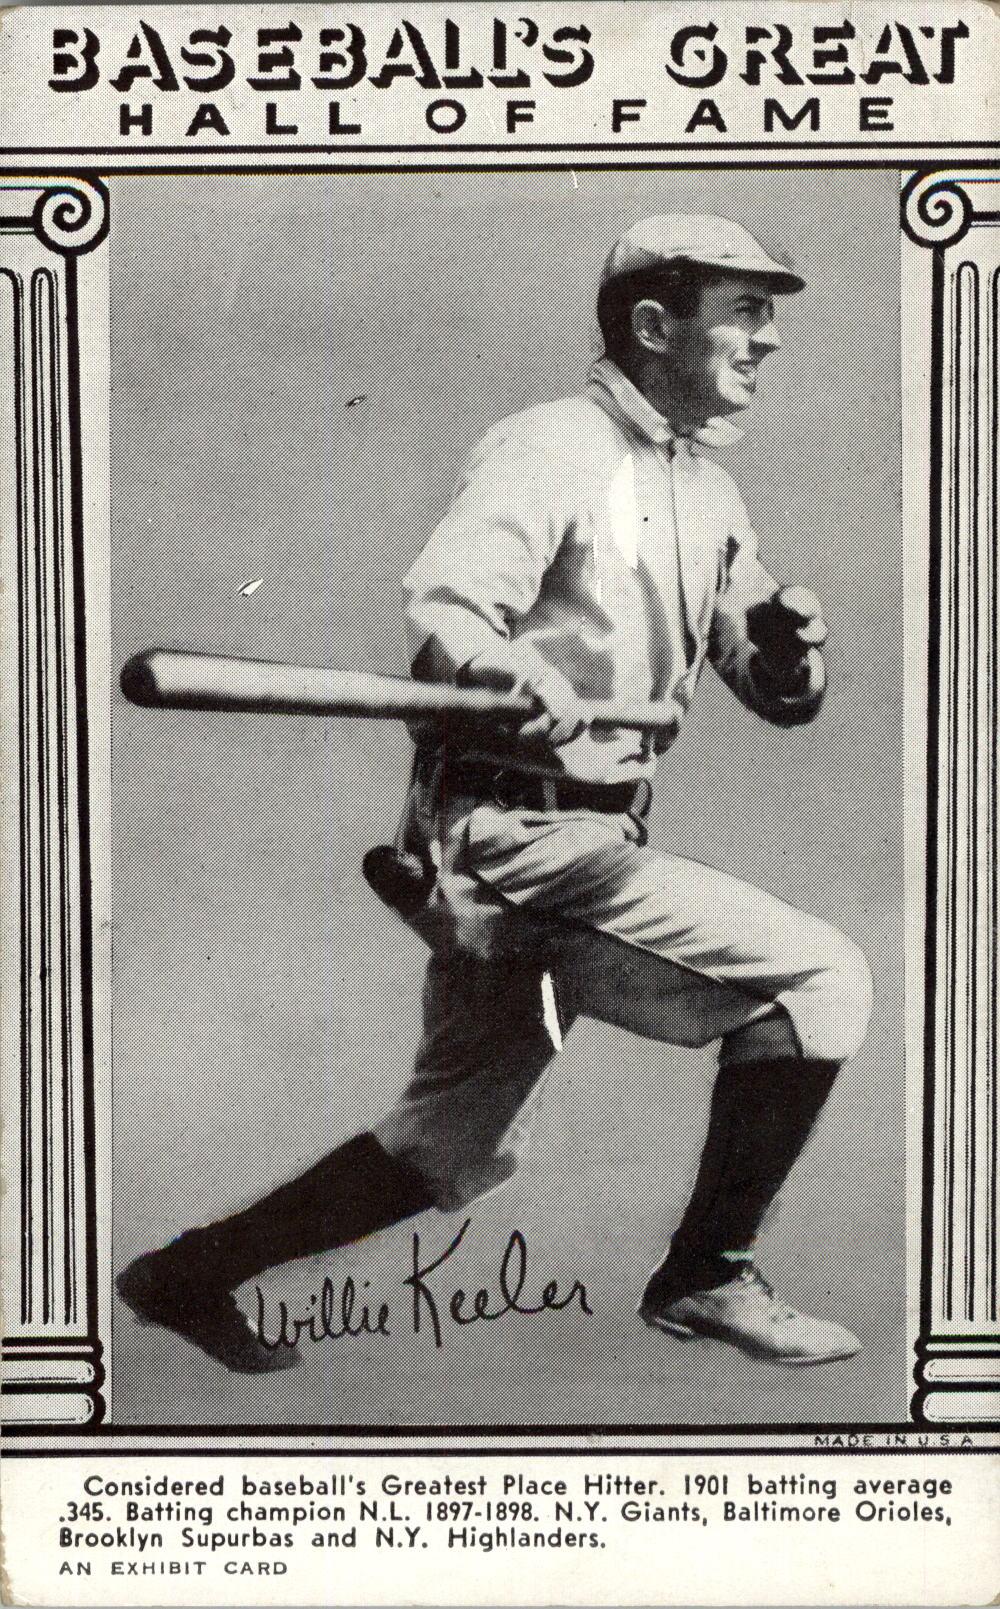 1948 Exhibit Hall of Fame #19 Willie Keeler